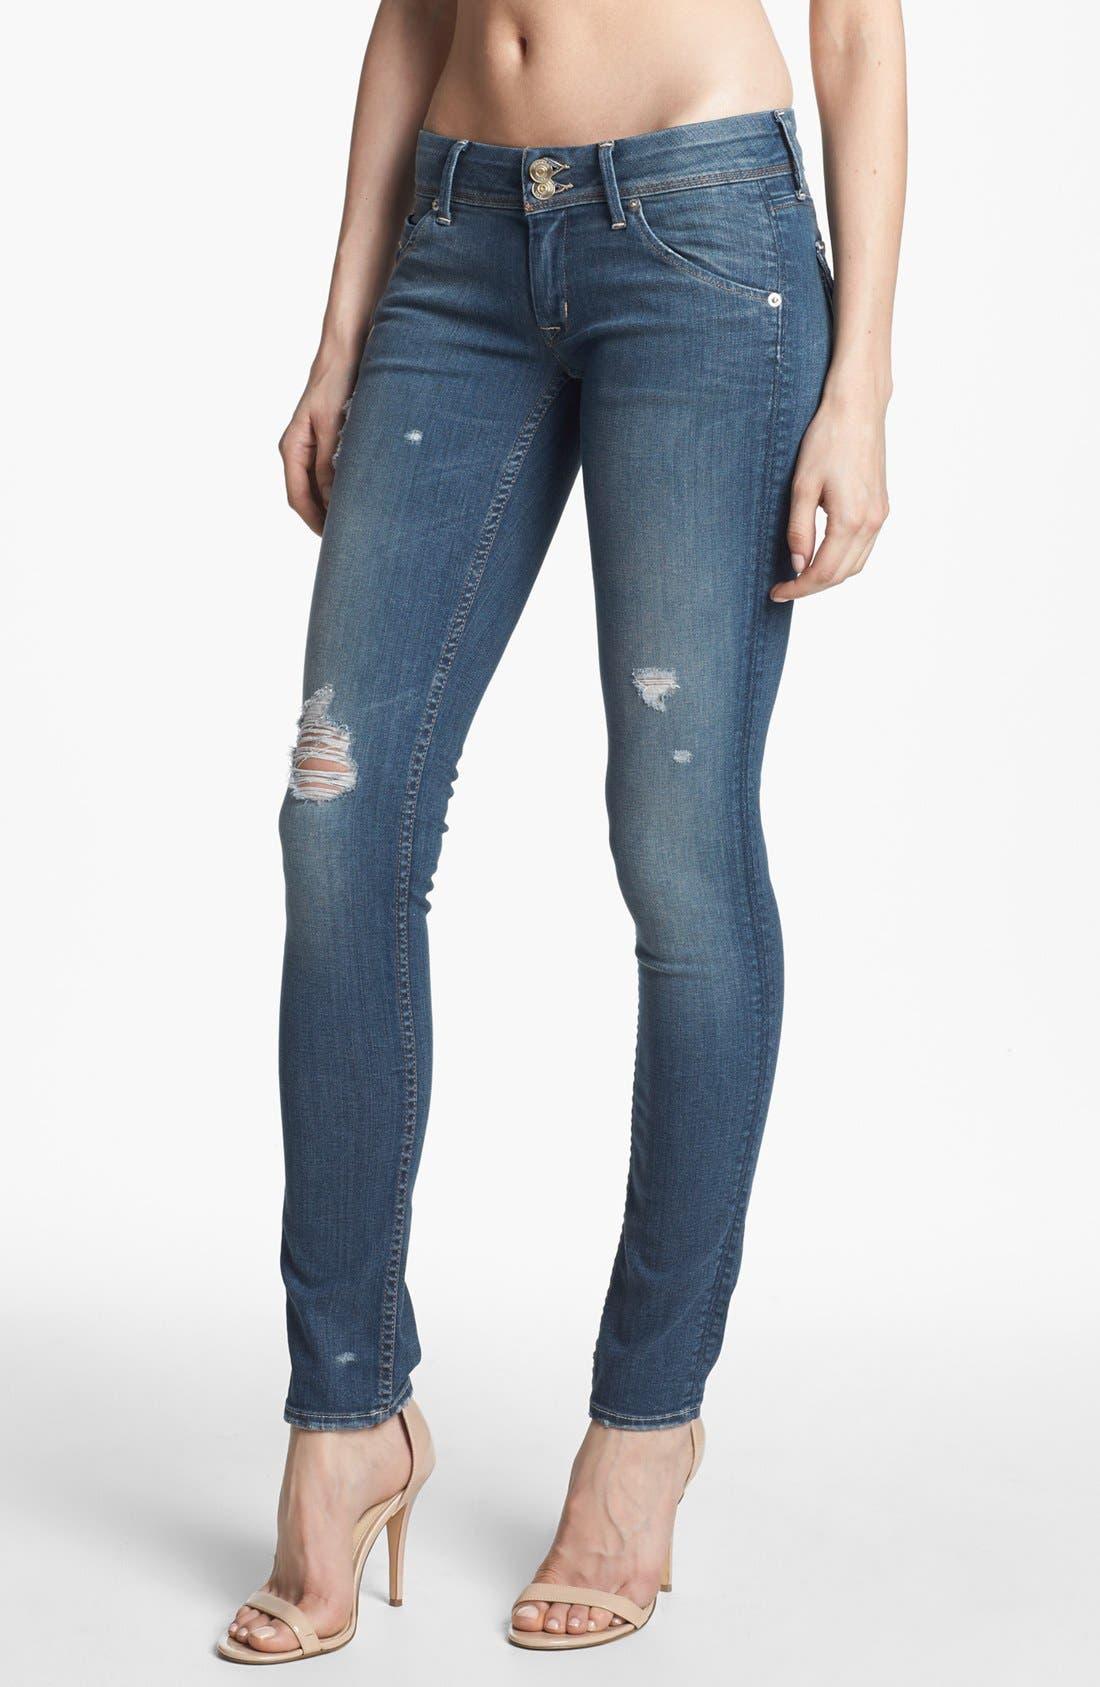 Alternate Image 1 Selected - Hudson Jeans 'Collin' Distressed Skinny Jeans (Vintage Florence)